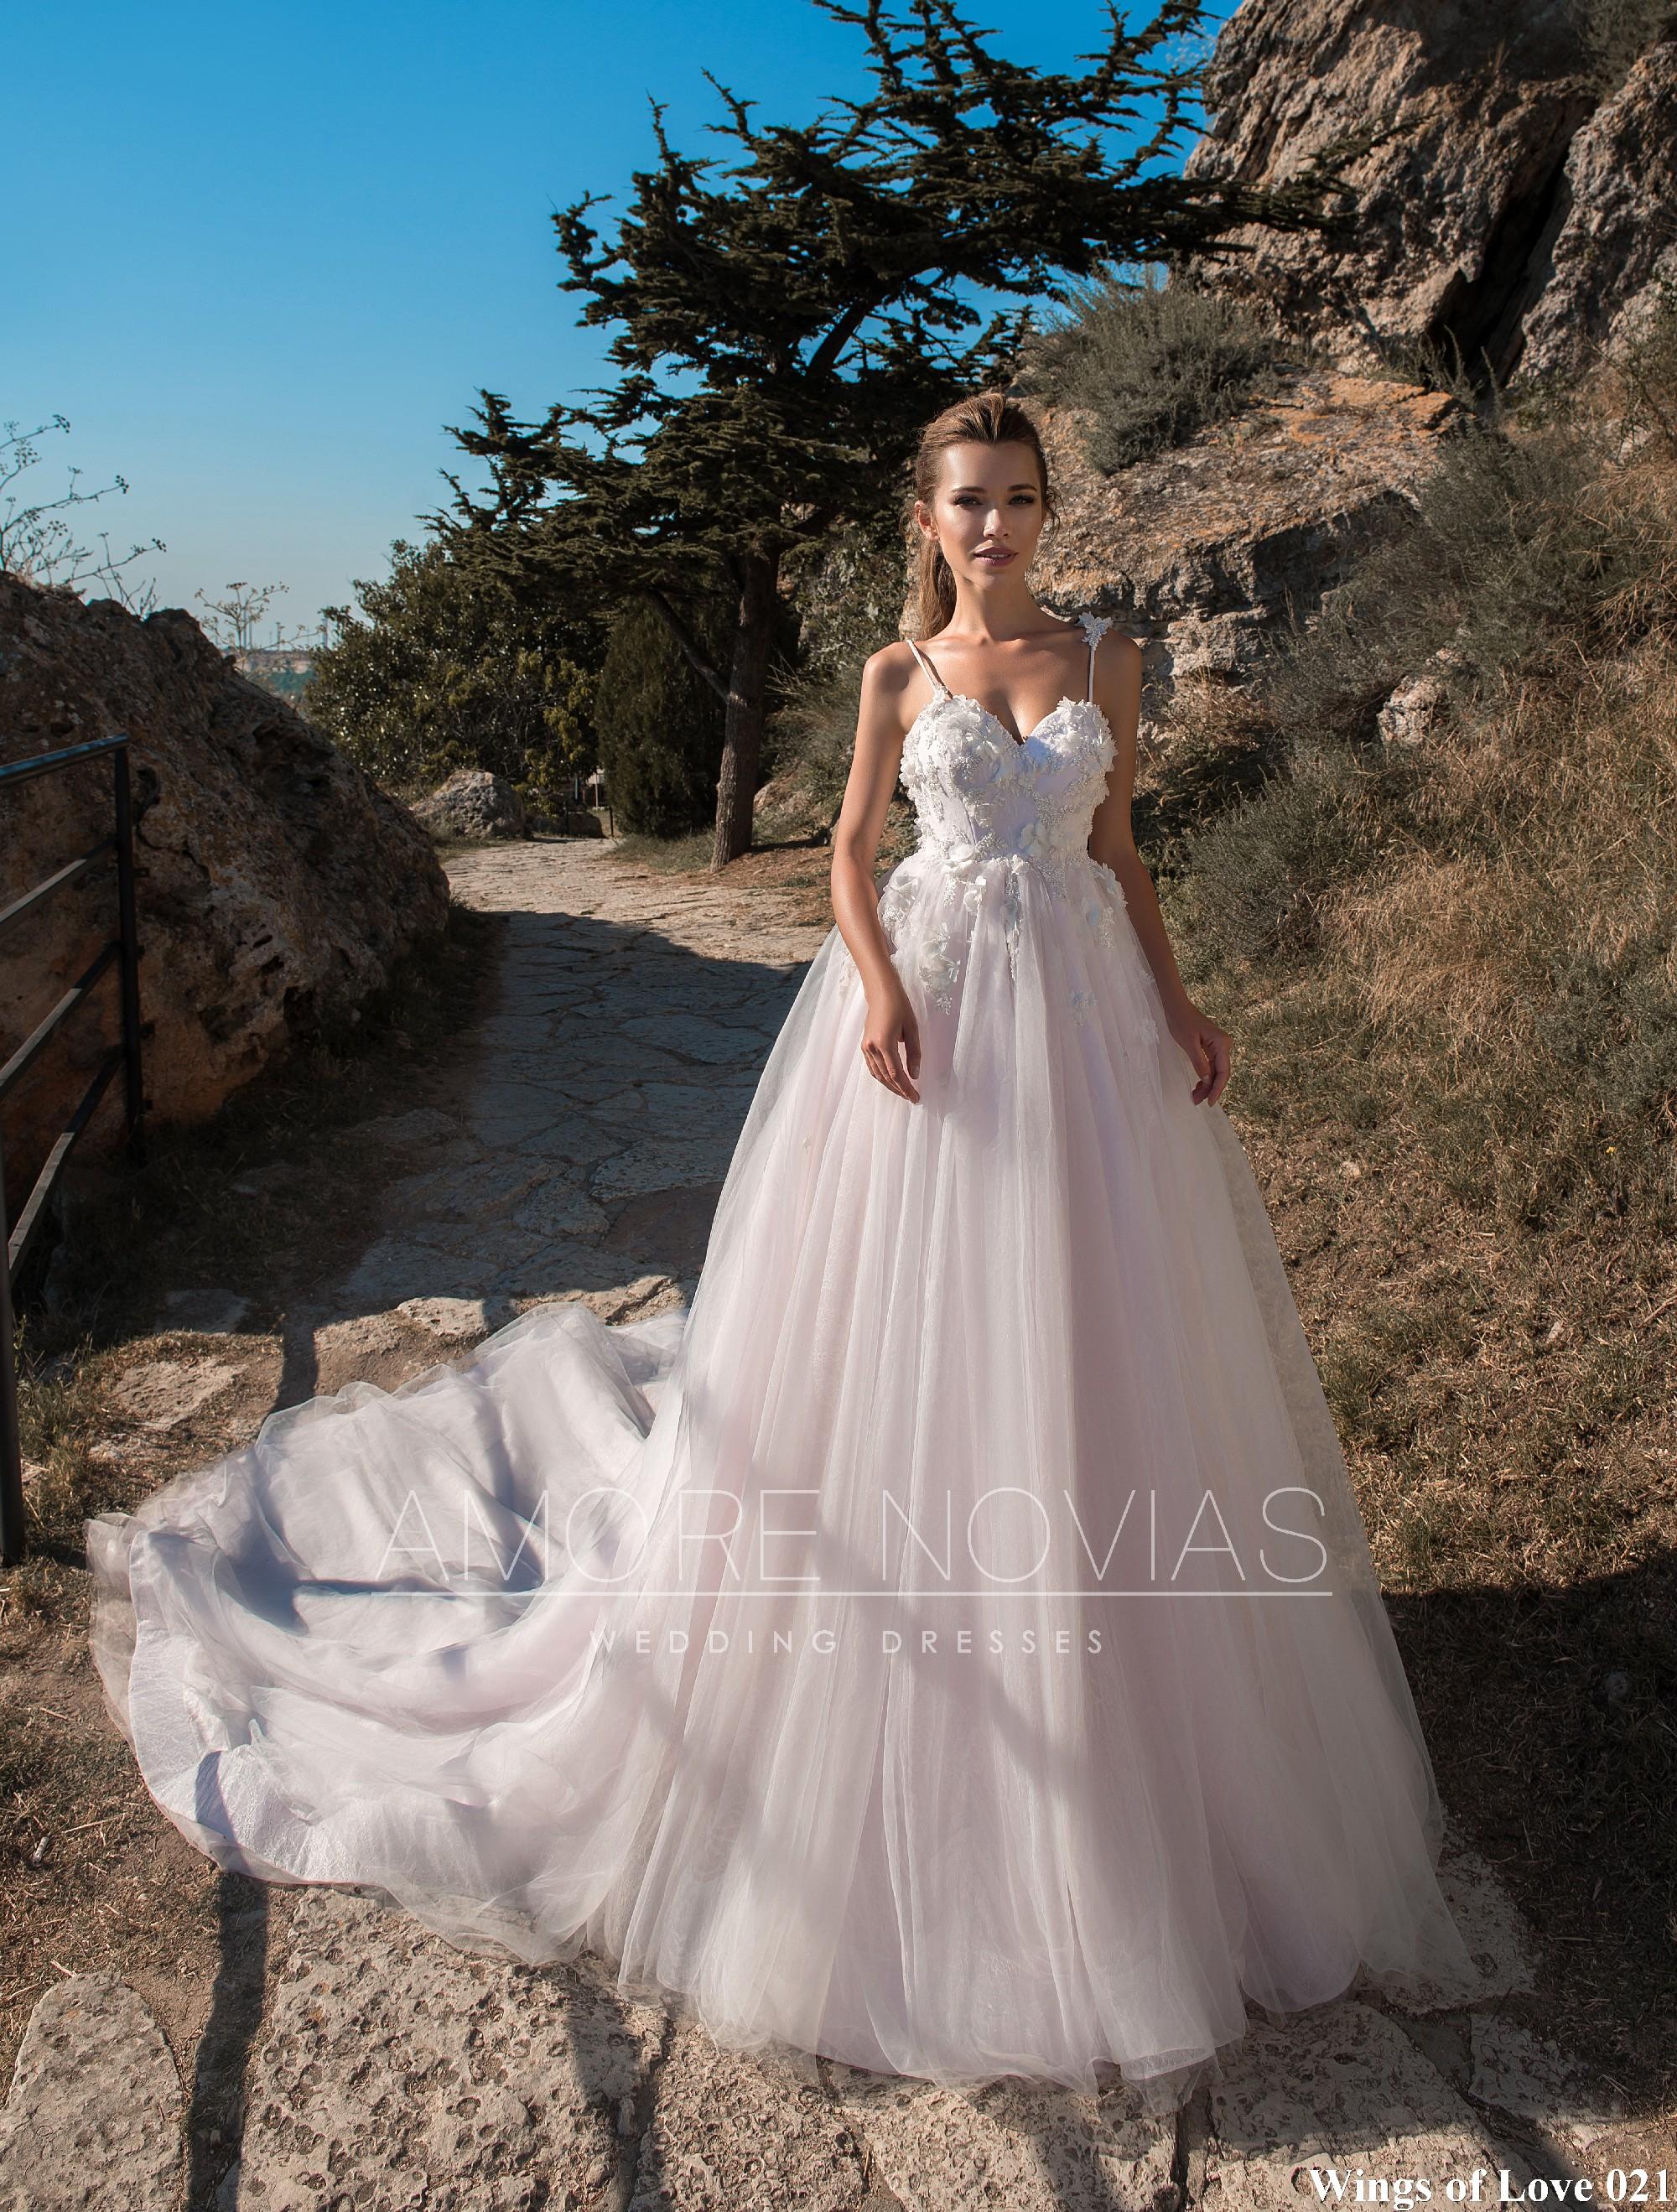 https://amore-novias.com/images/stories/virtuemart/product/lk-021-------(1).jpg